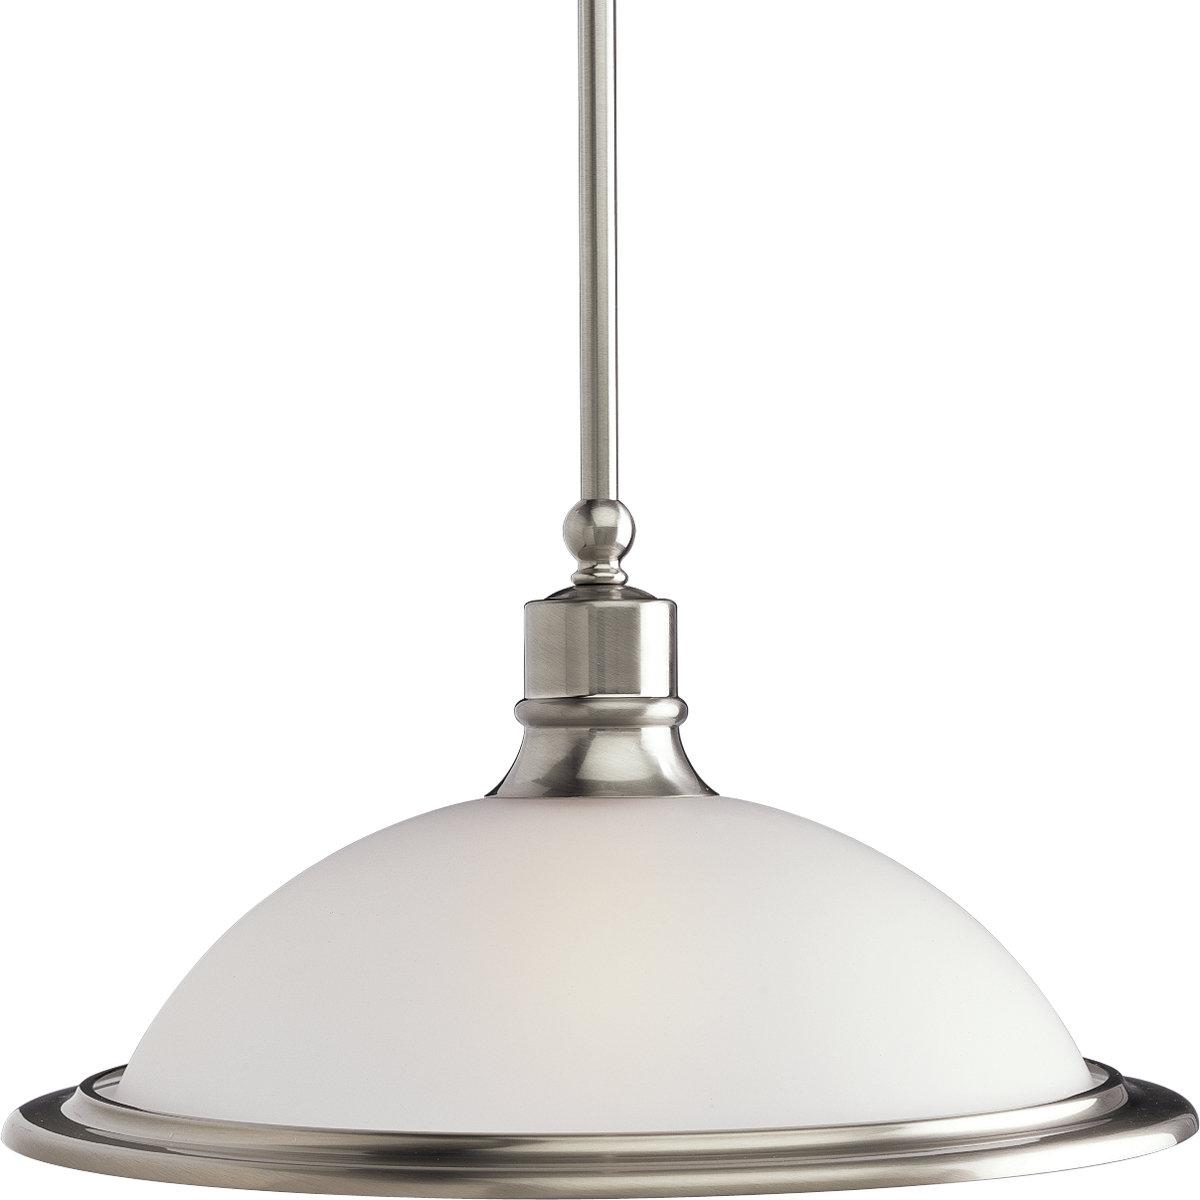 Vangorder 1-Light Dome Pendant pertaining to Abernathy 1-Light Dome Pendants (Image 28 of 30)